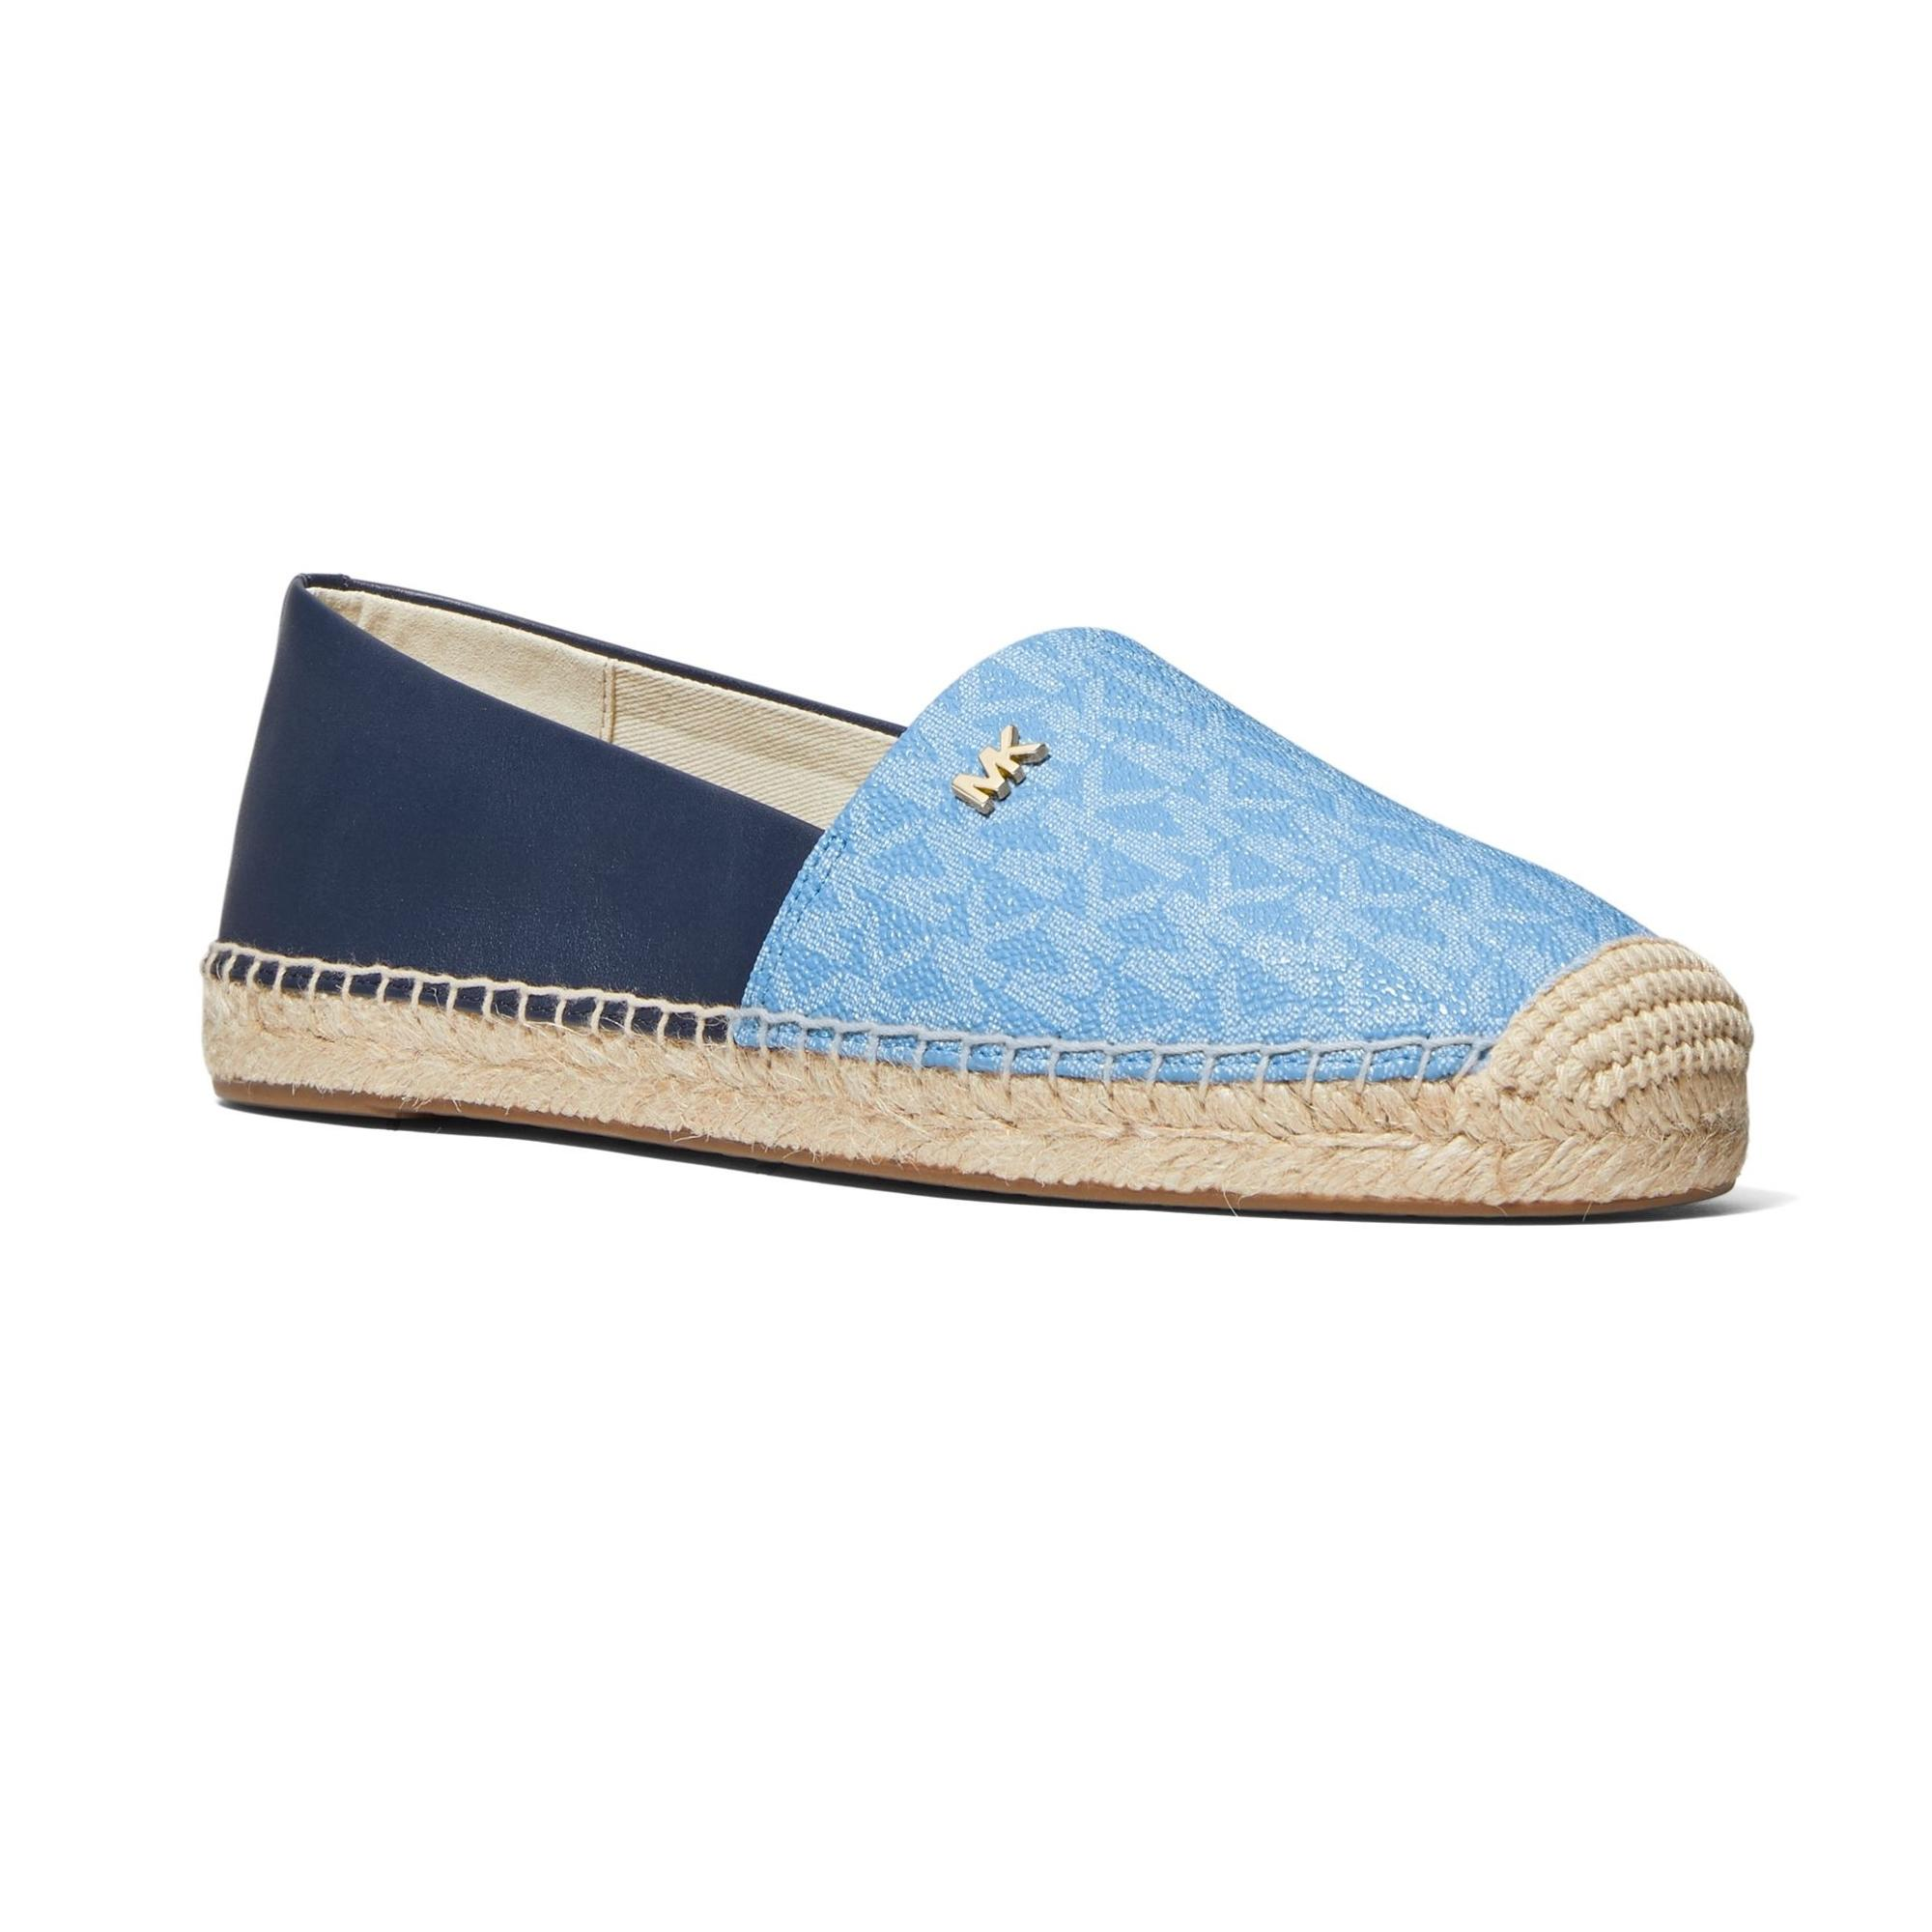 MICHAEL KORS 藍色 Logo 草編鞋